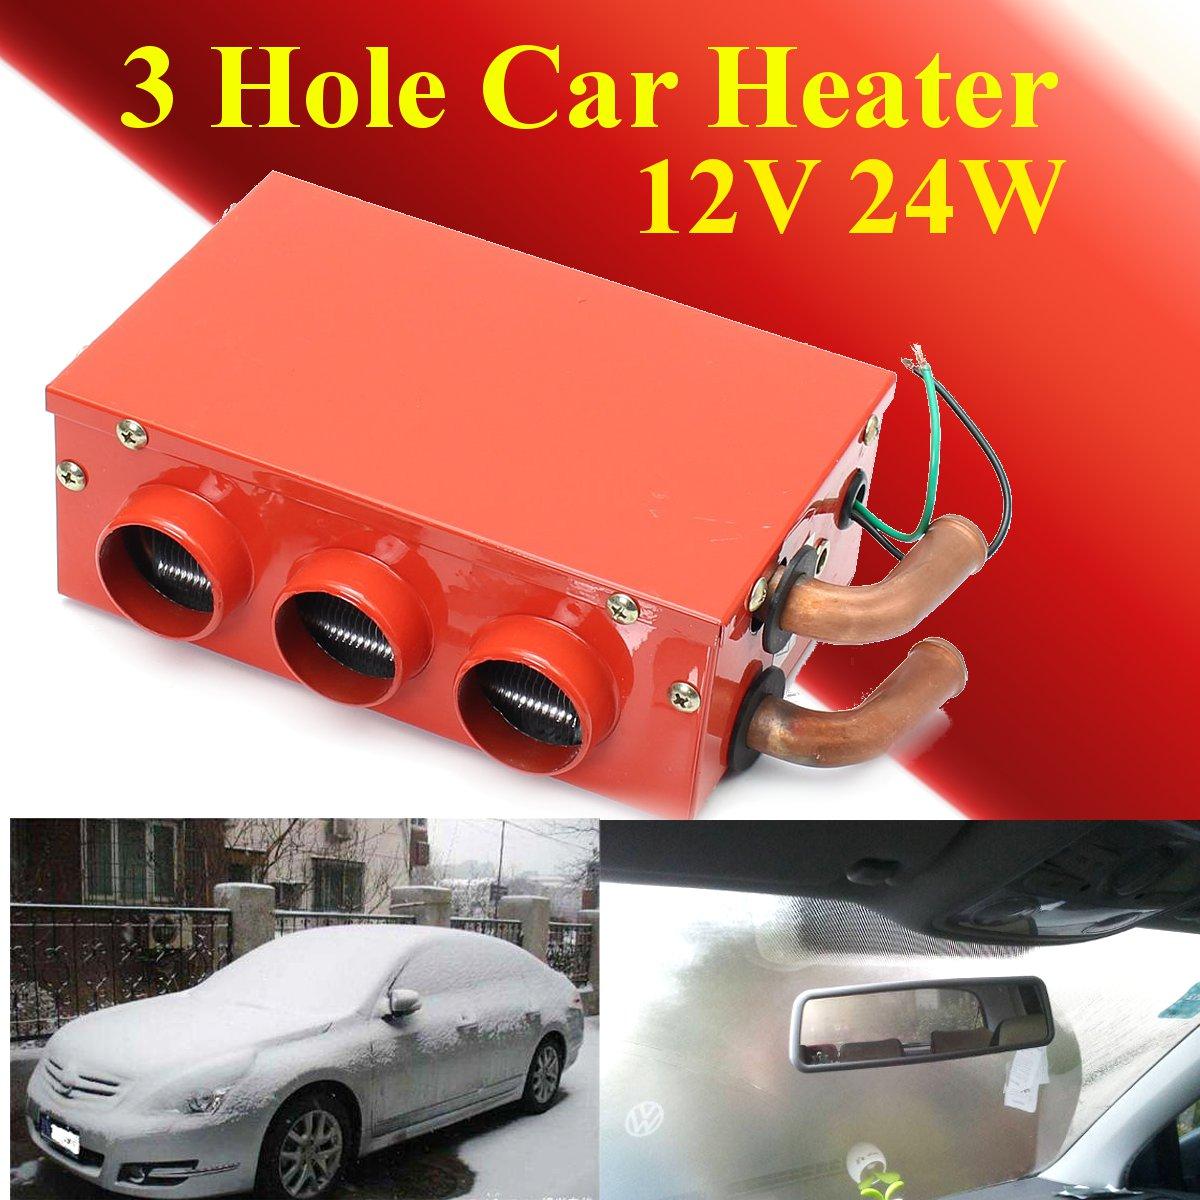 600W Car Heater Fan Metal shell Front Windshield Defroster for Car Truck 12V US